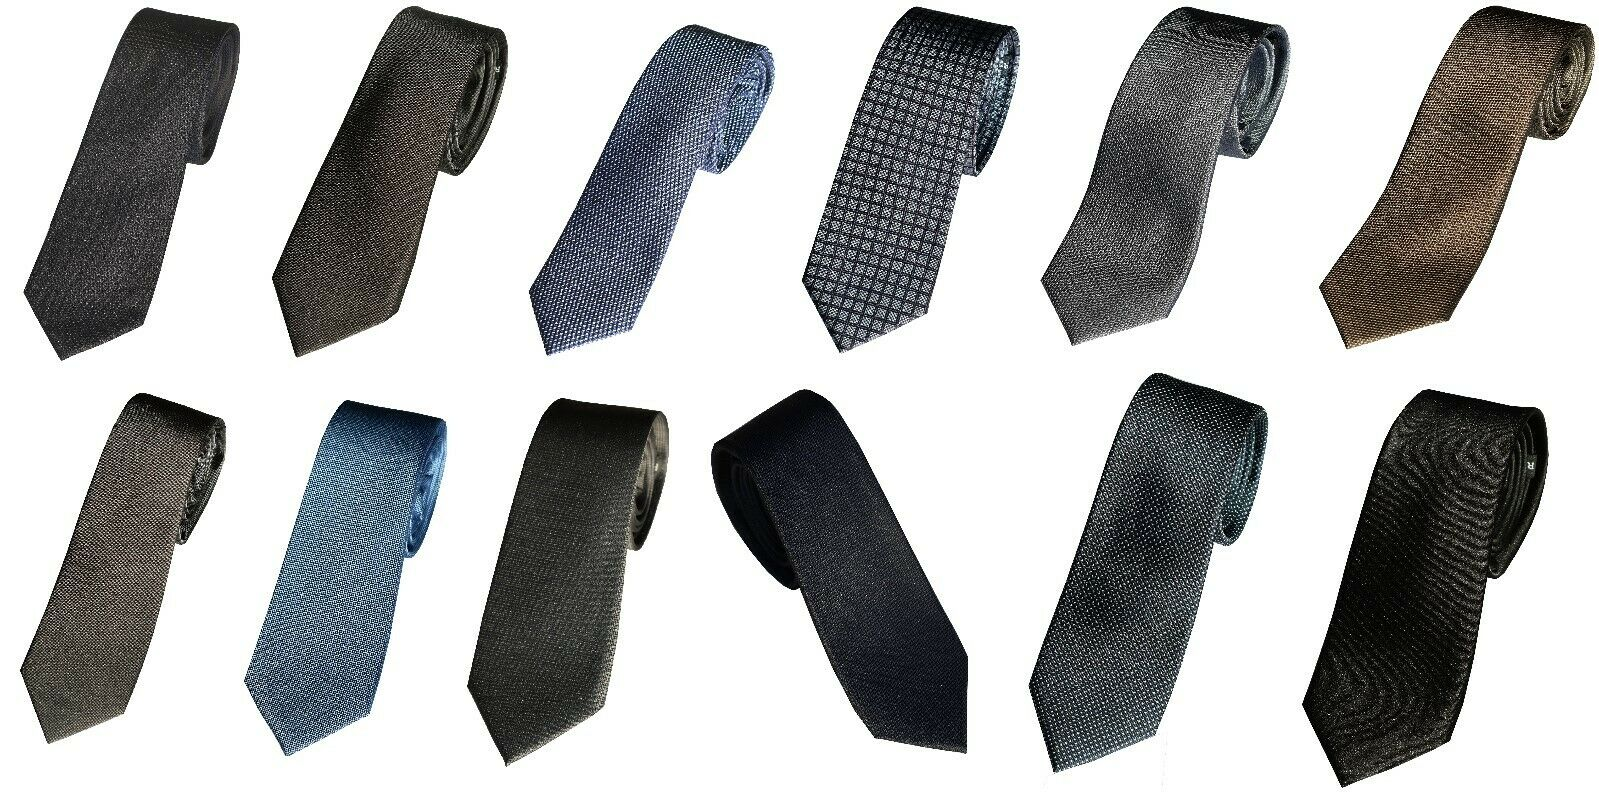 Royal Class Seidenkrawatte Krawatte Schlips Binder Blau Grau Schwarz Breite 6,5